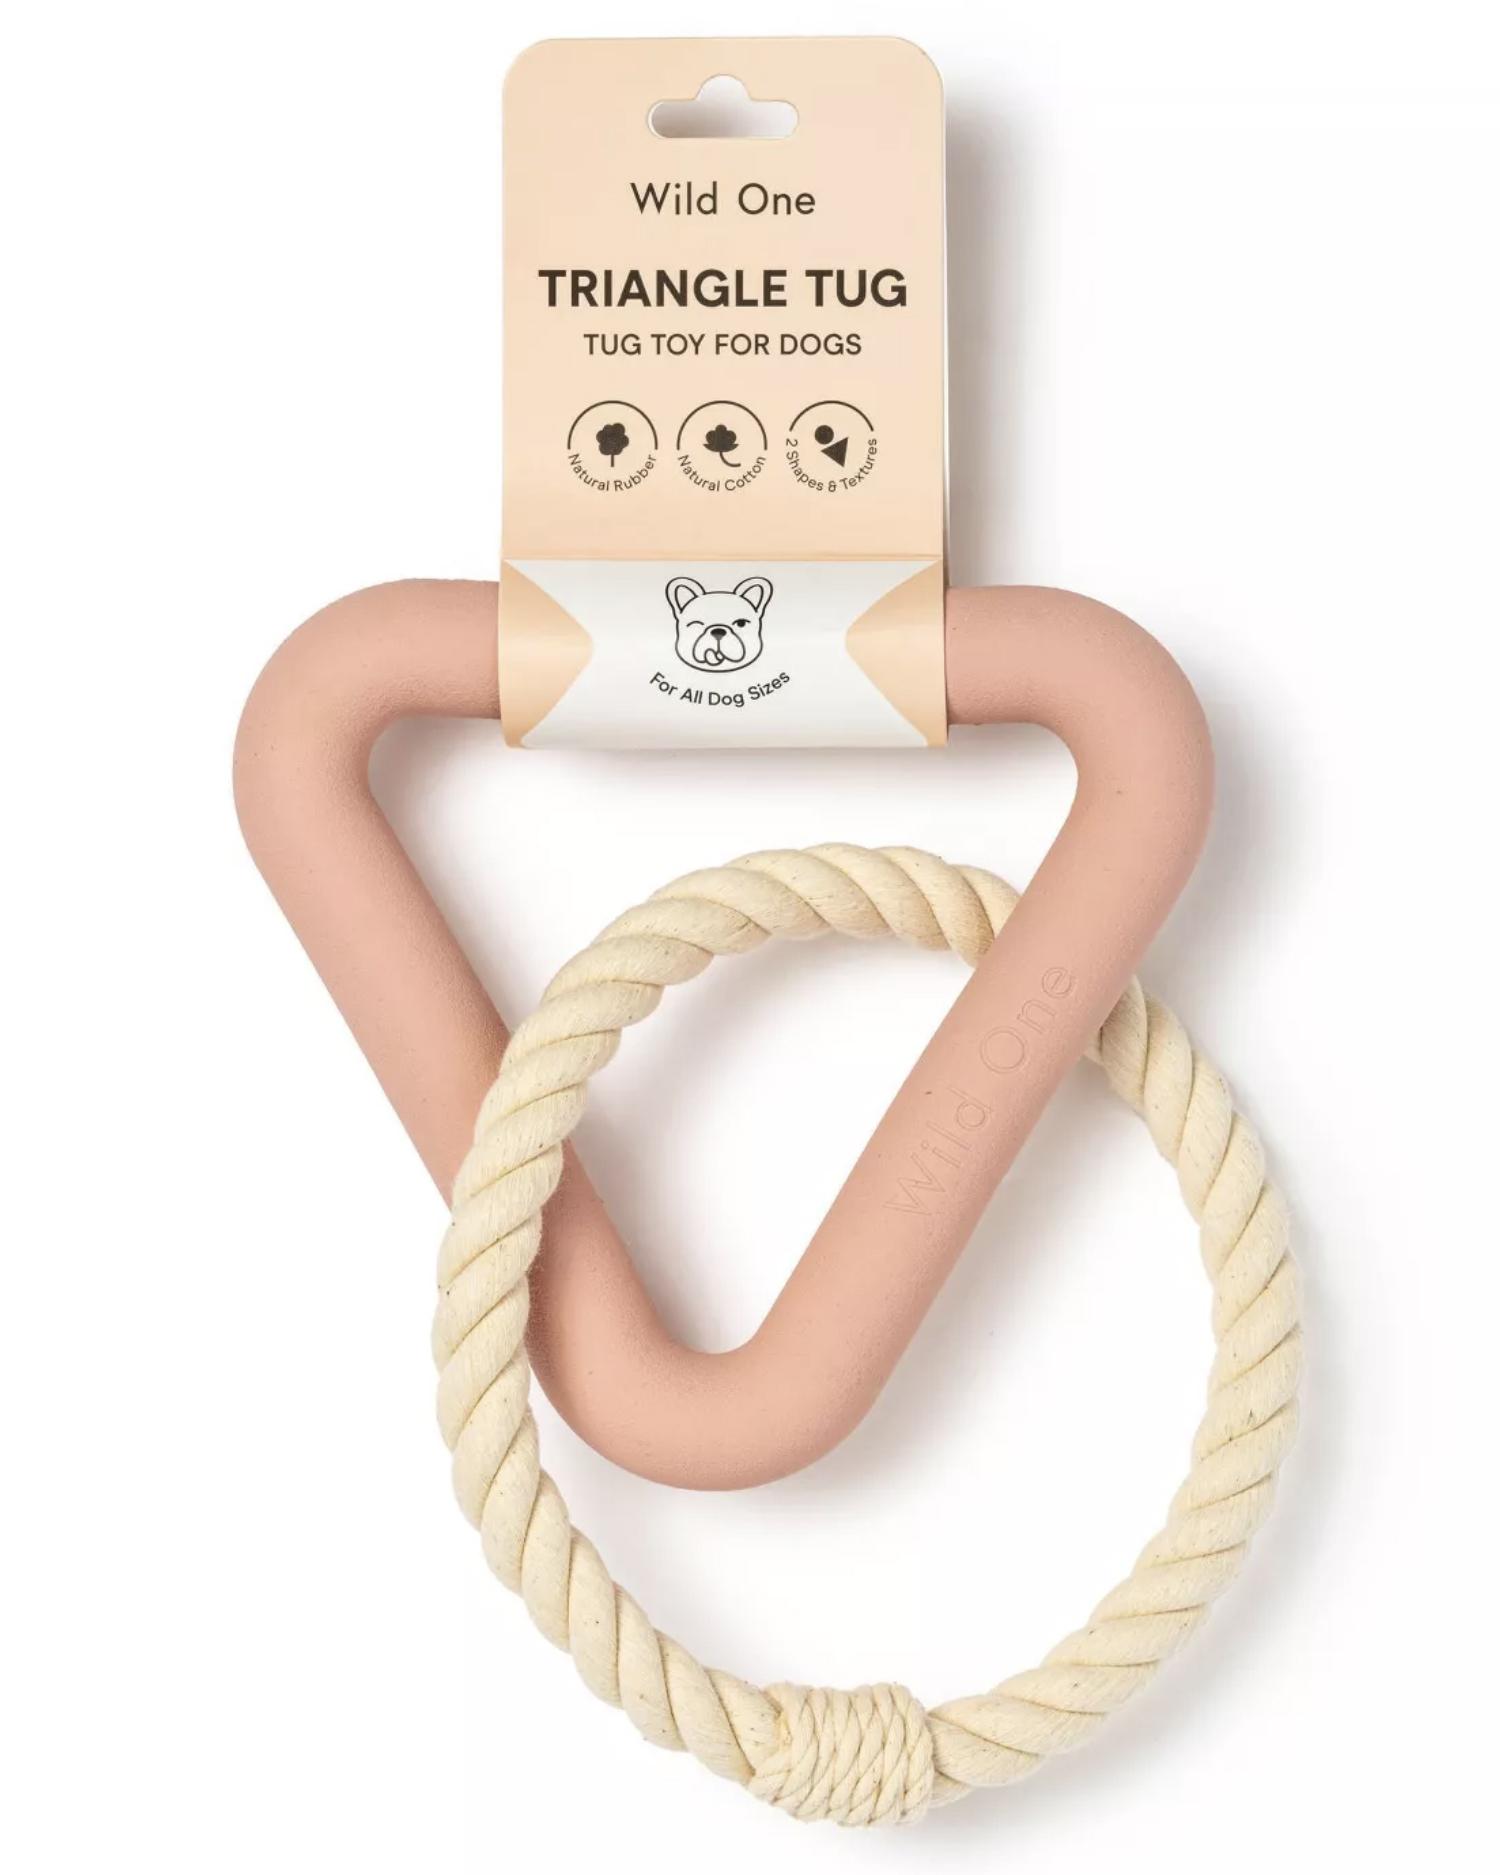 Wild One Triangle Tug Toy (via Target)